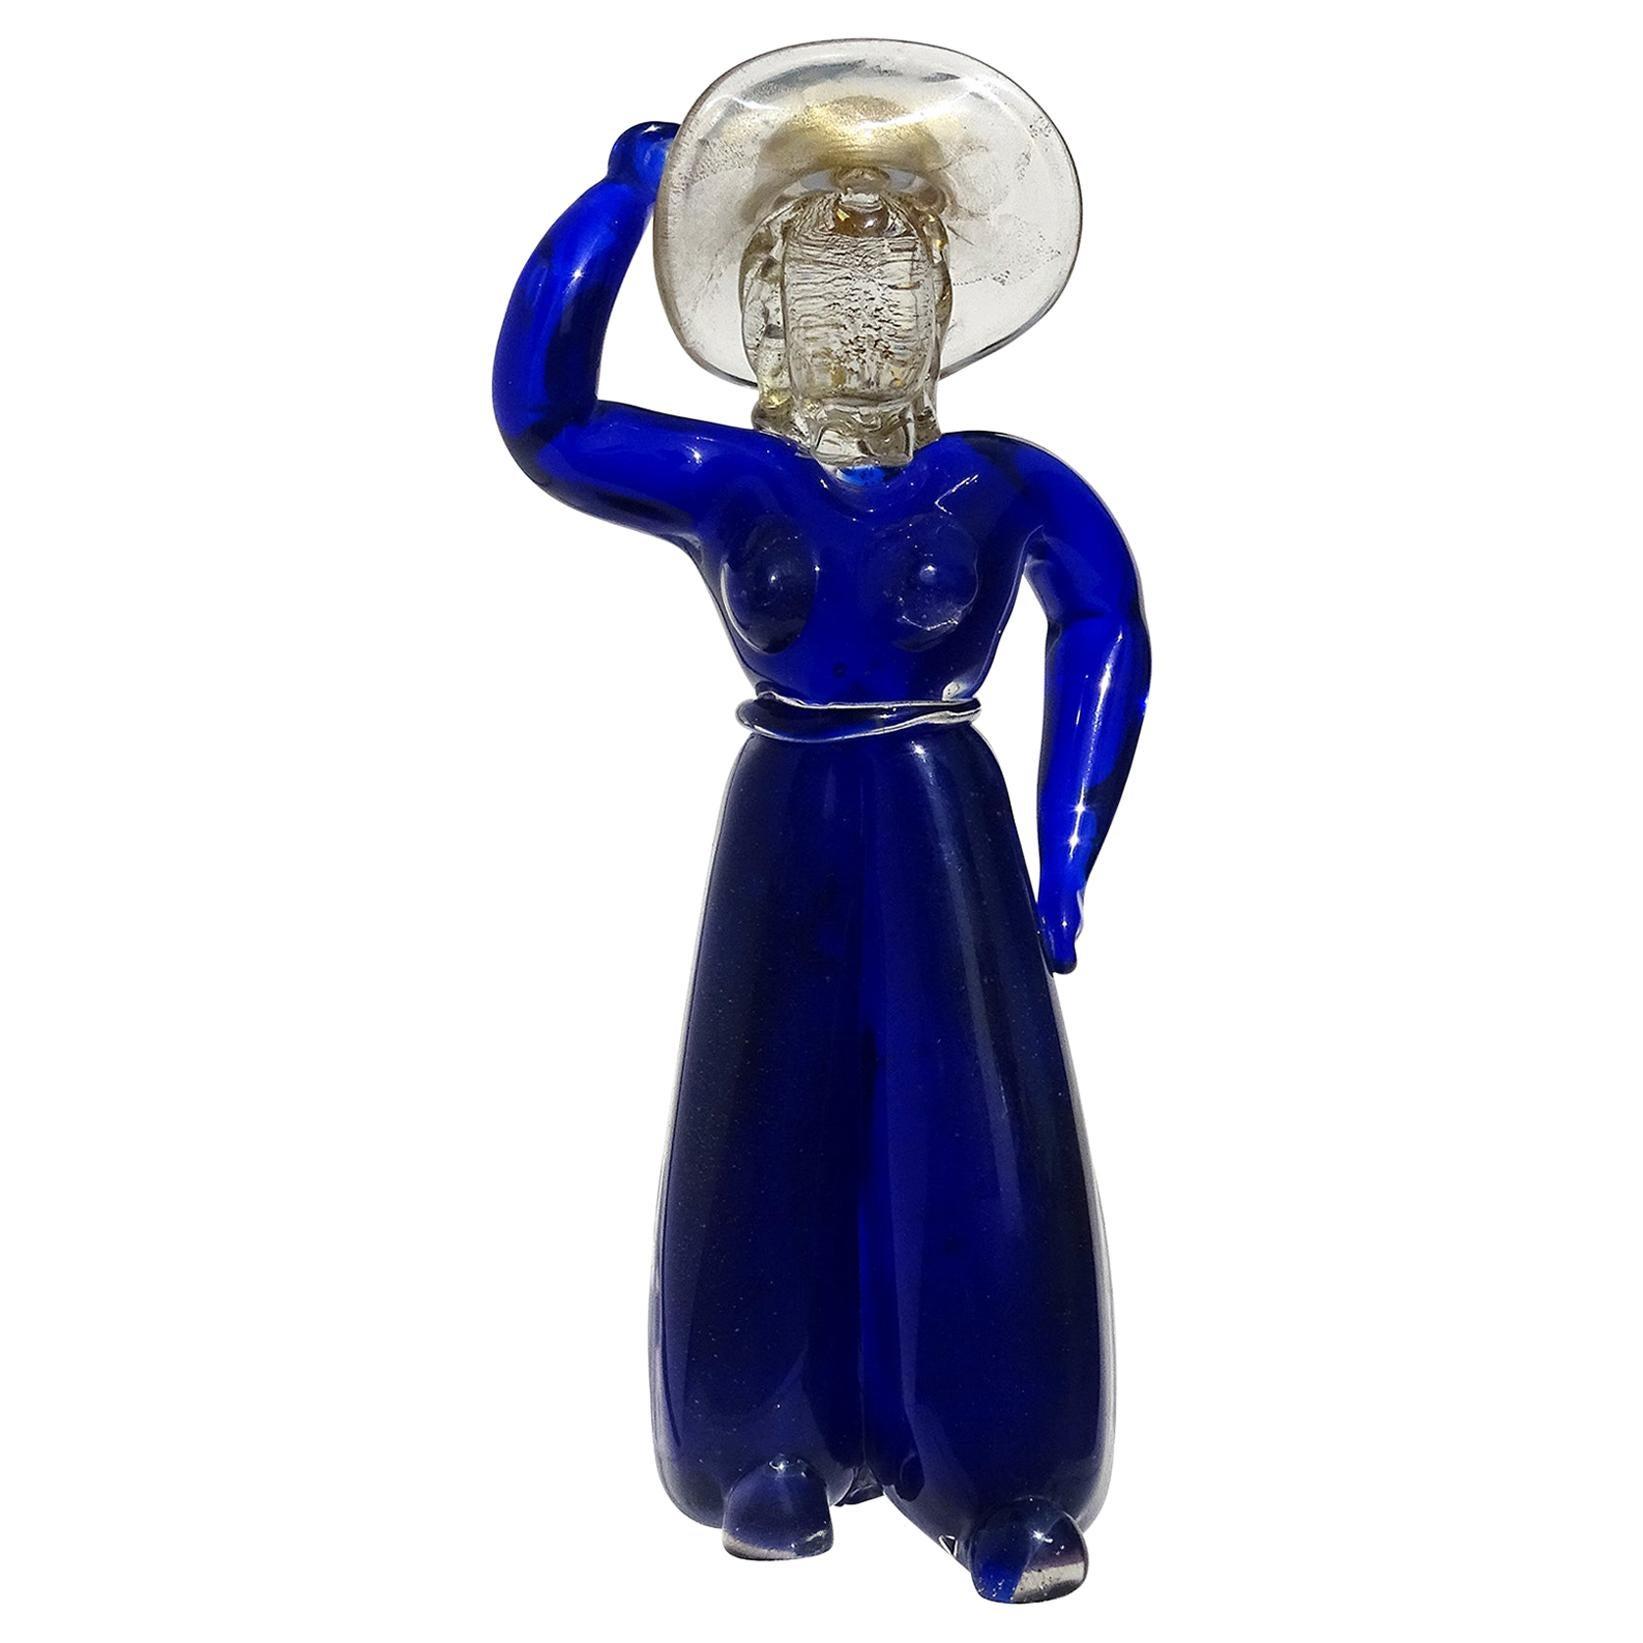 Barbini Murano Blue Gold Woman with Sun Hat Italian Art Glass Figure Sculpture